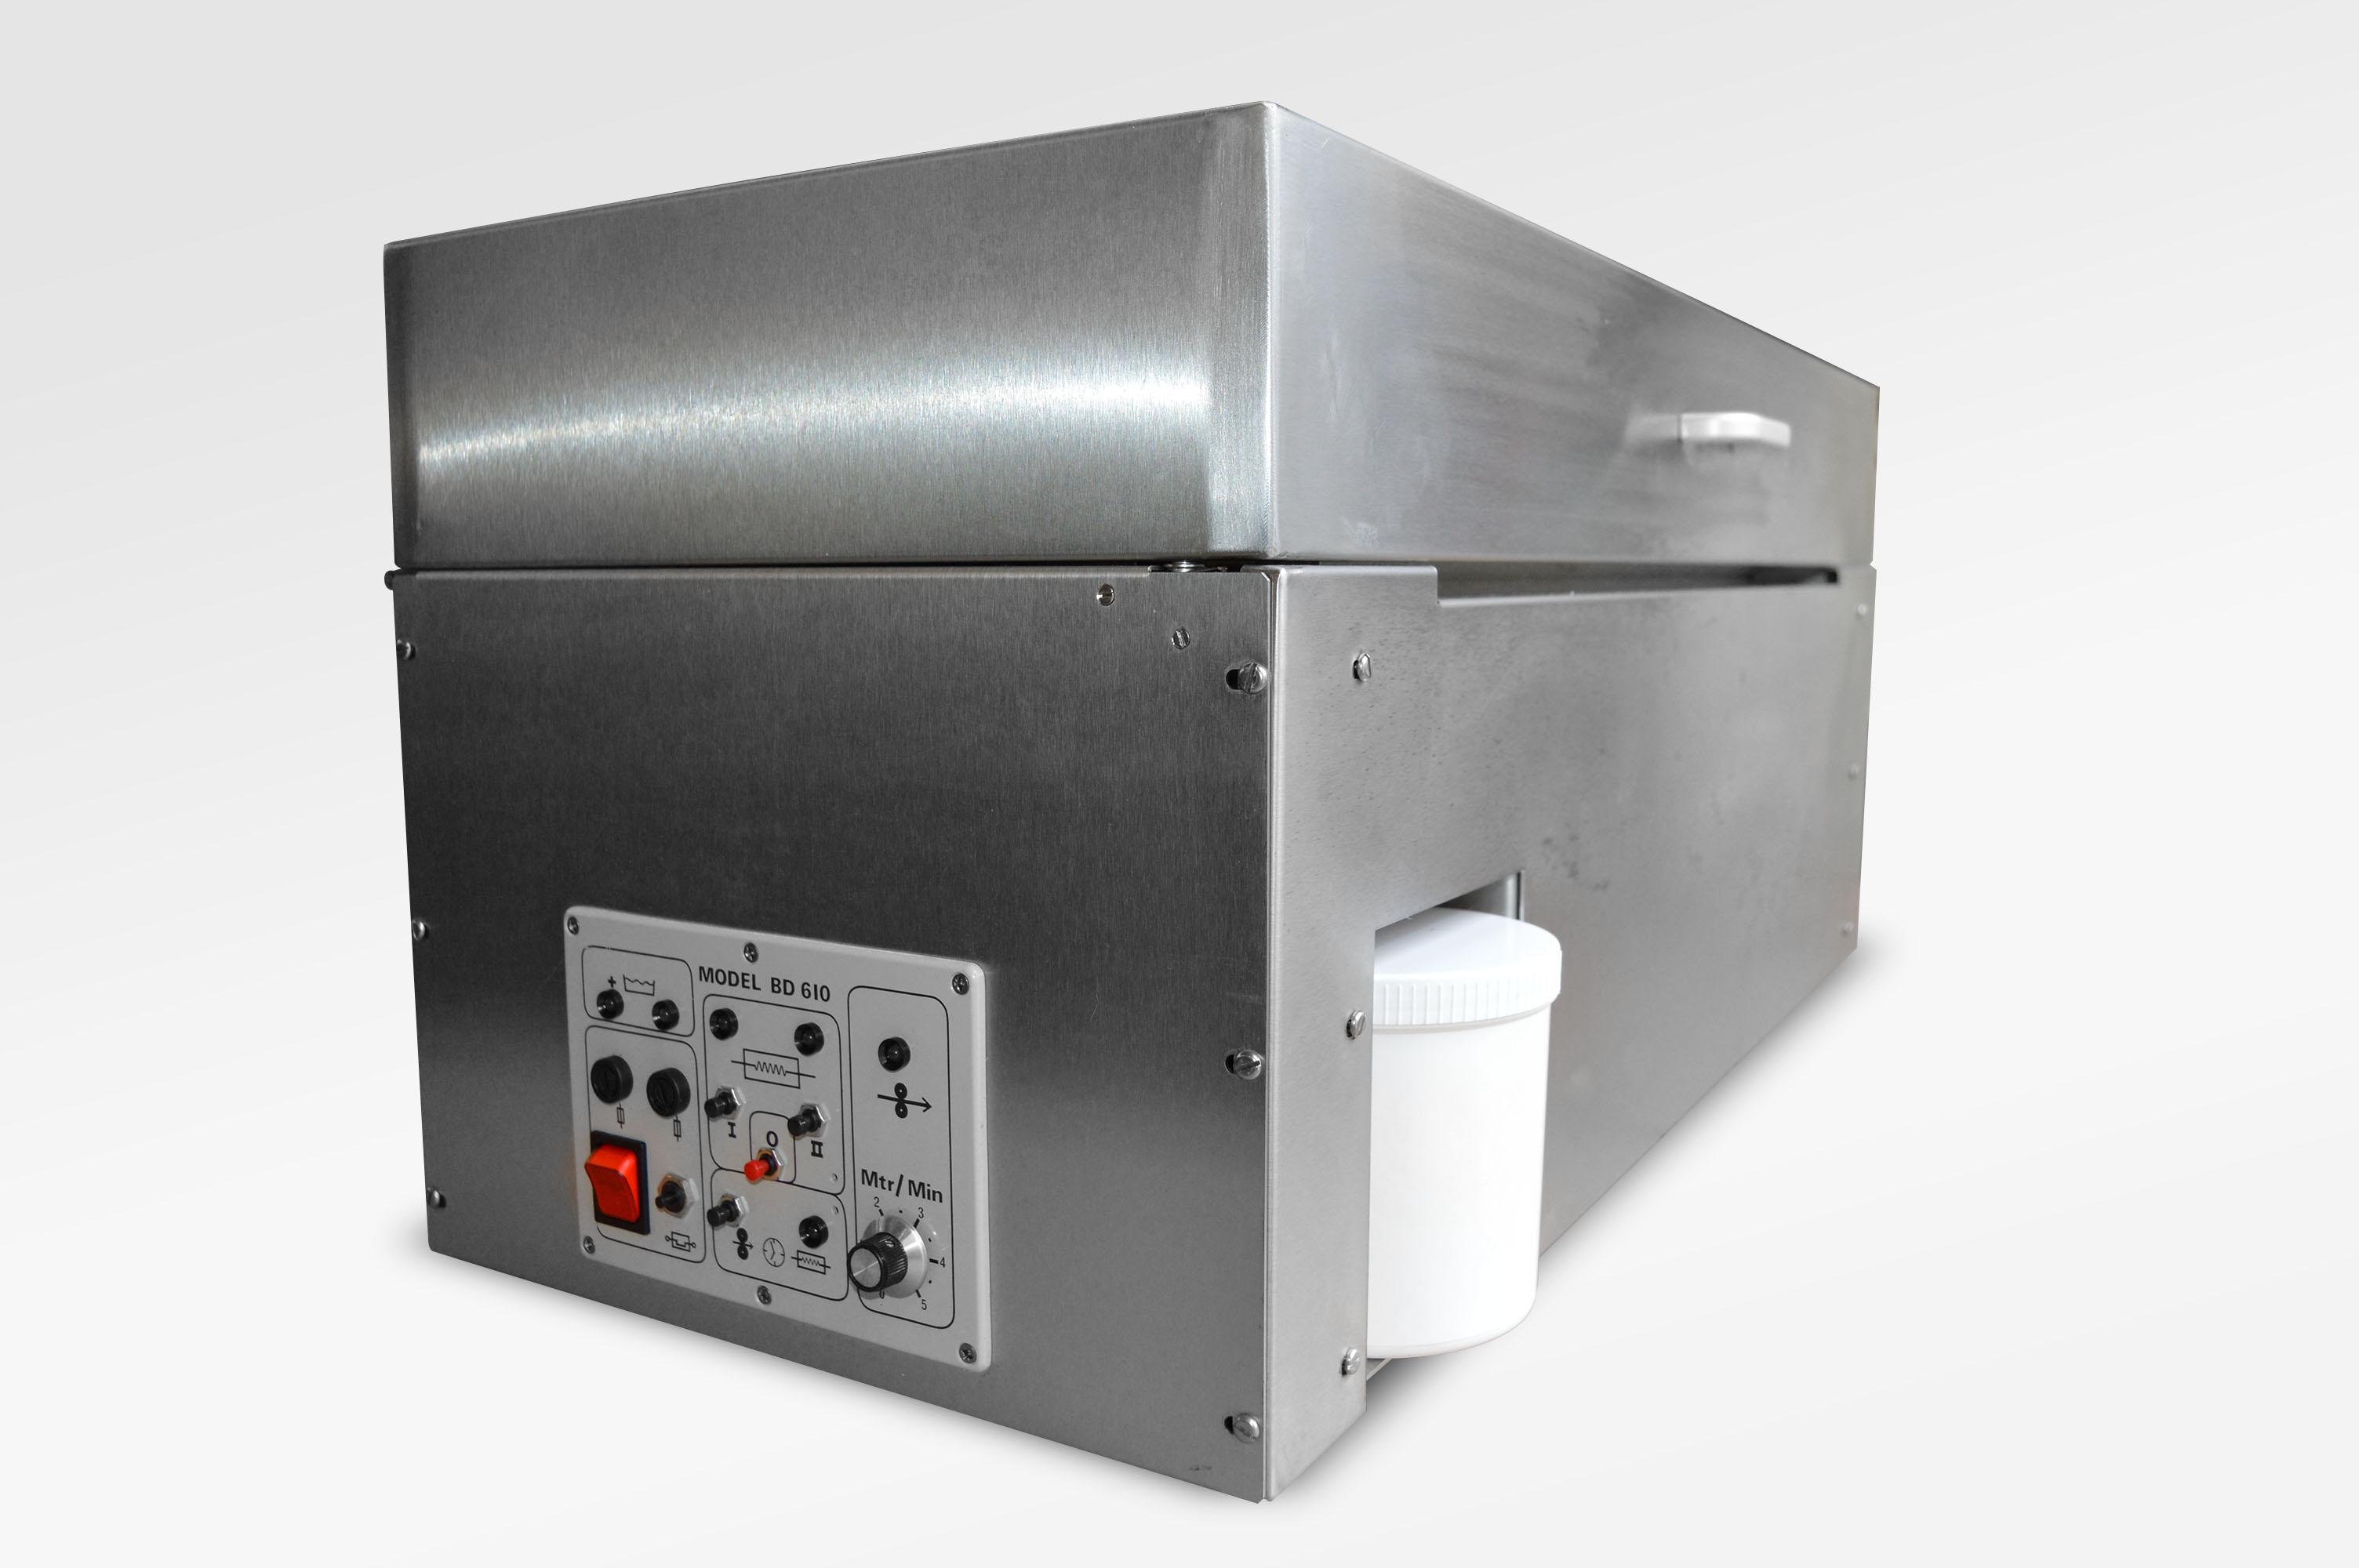 PCb Board Dryer Control Panel